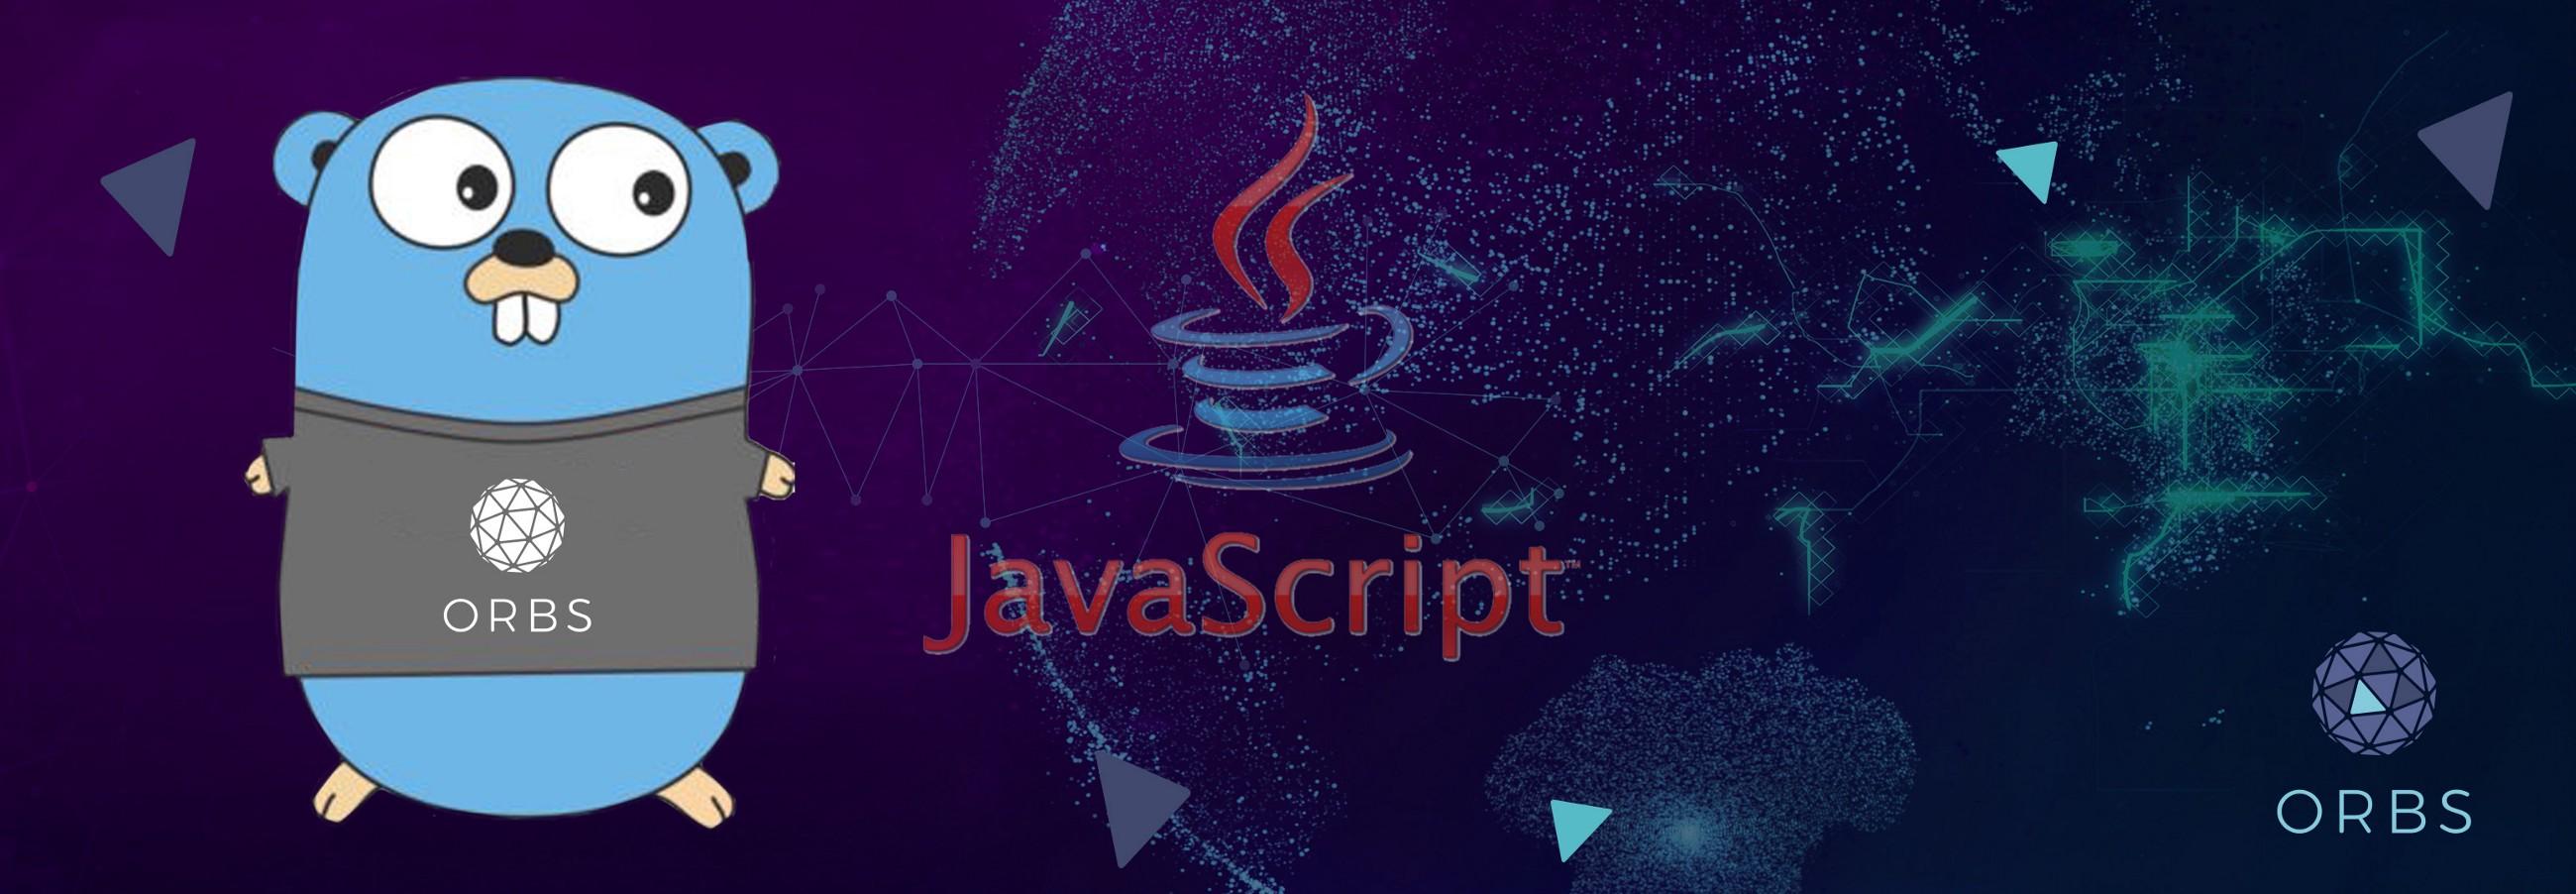 /introduction-to-go-for-javascript-developer-3e783b409e52 feature image